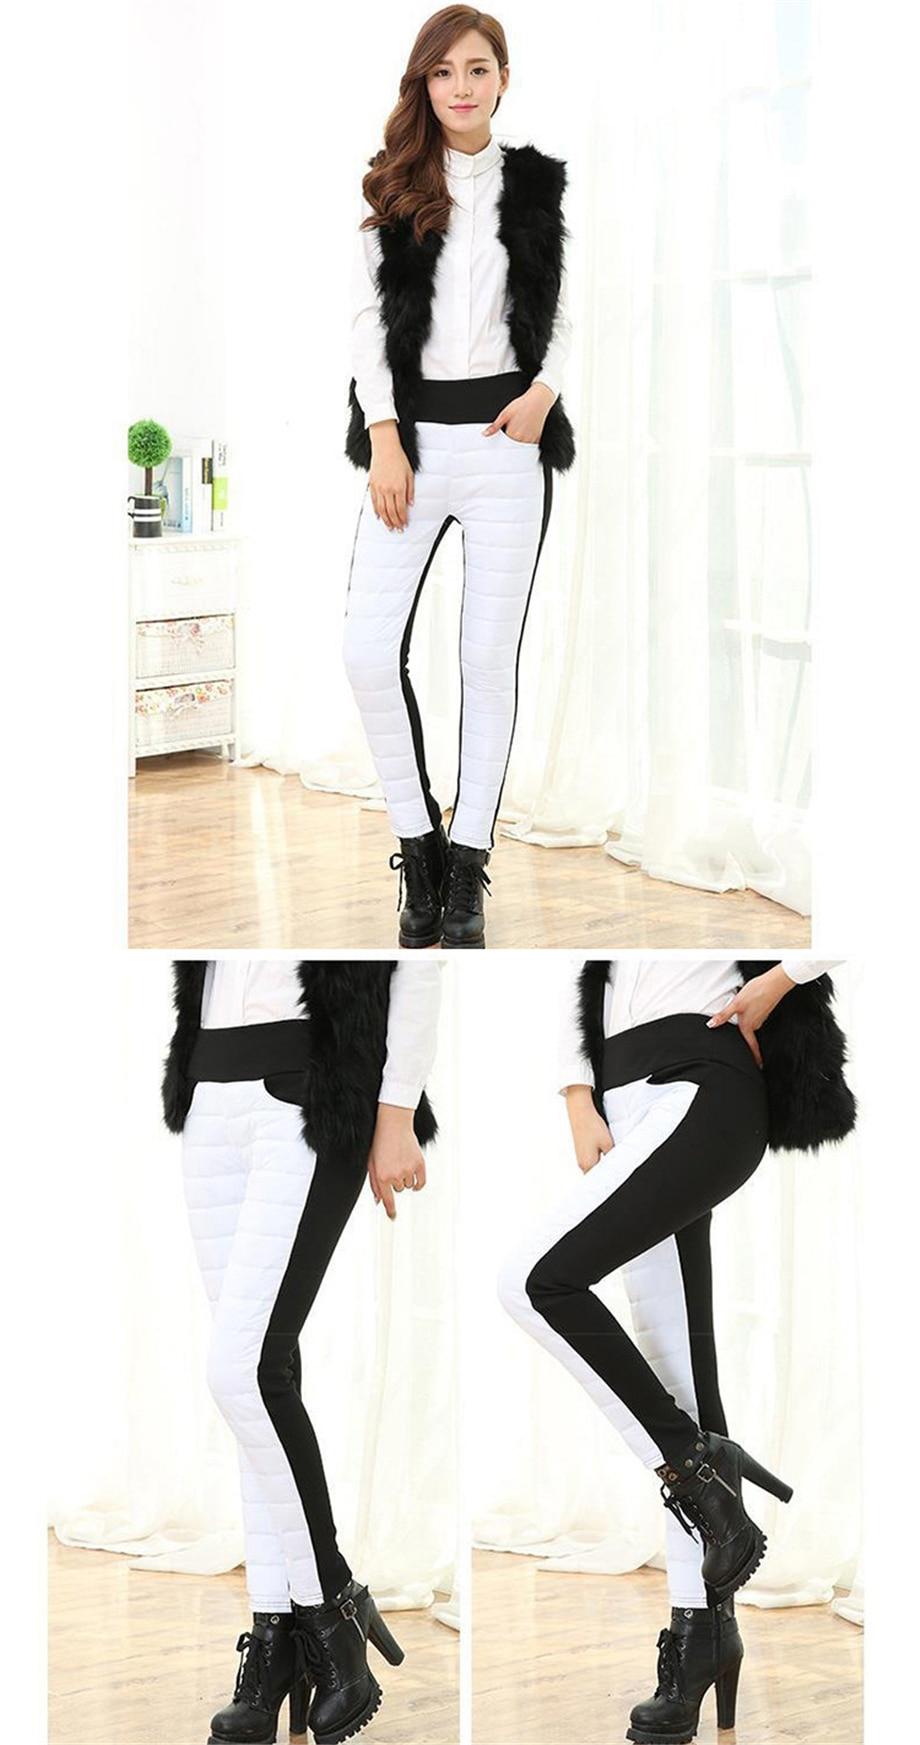 Thicken down Cotton Winter Warm Pants Women Elastic Waist Ladies Skinny Trousers Women's Casual Leggings Outwear Female Pants 23